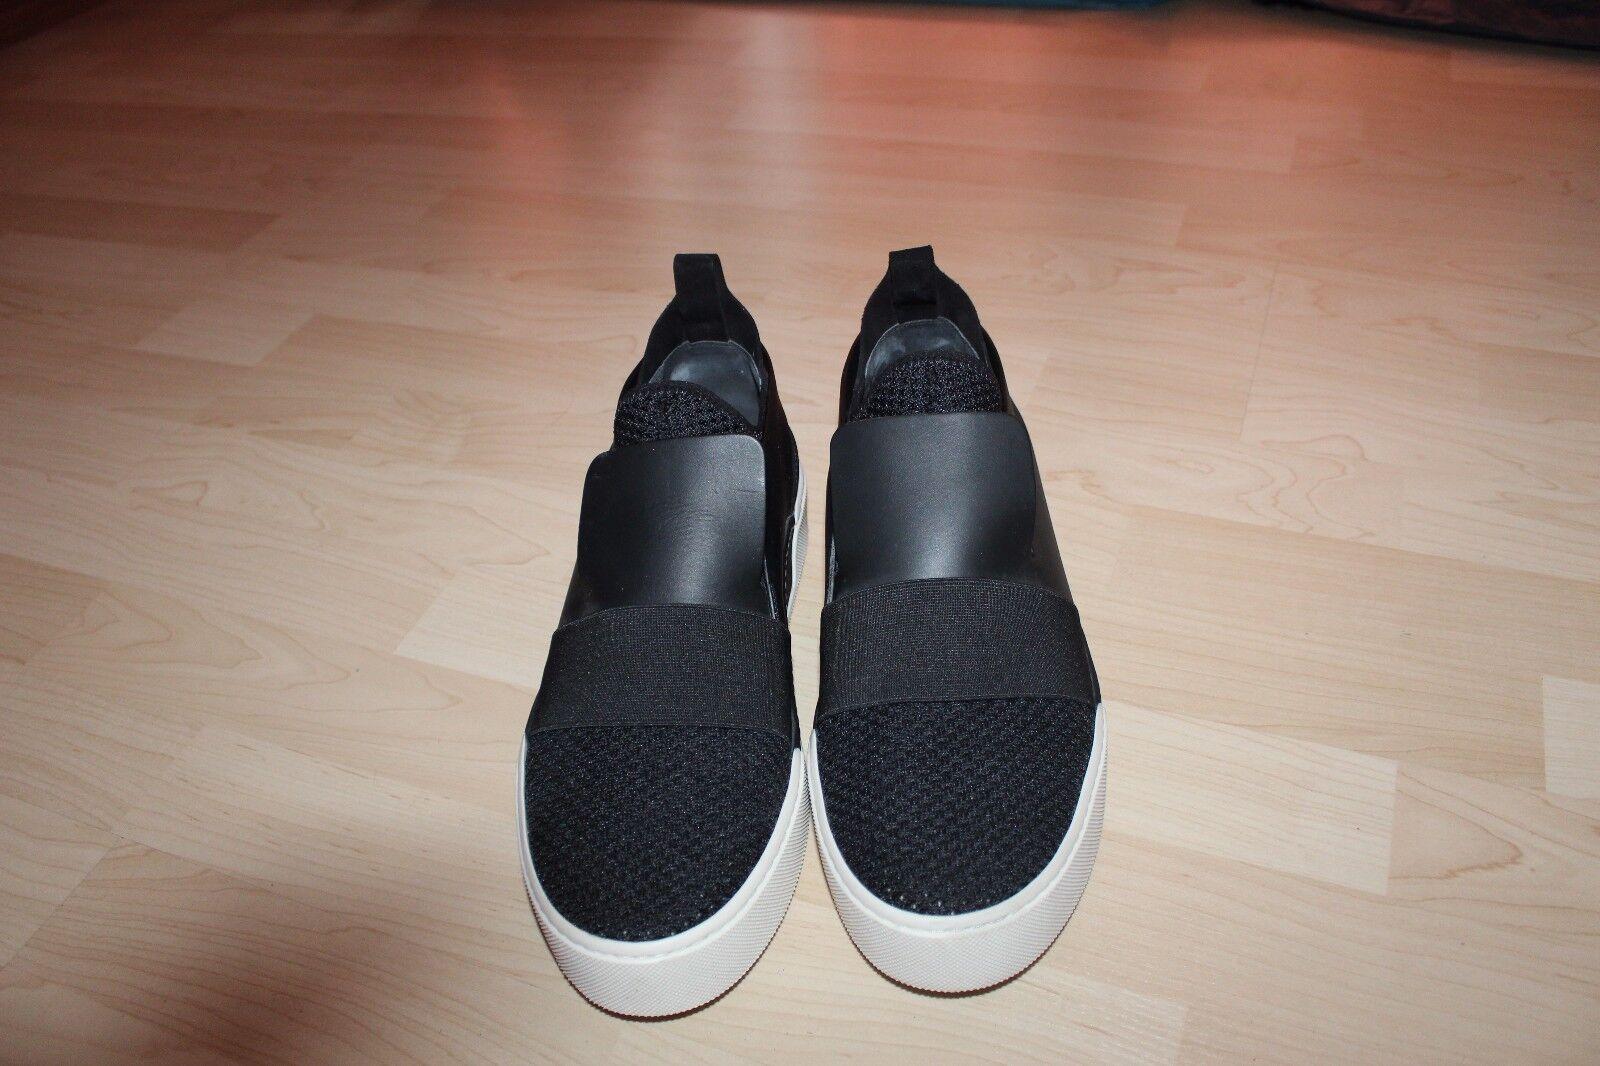 Billig gute Qualität Balenciaga herren sneakers gr 43